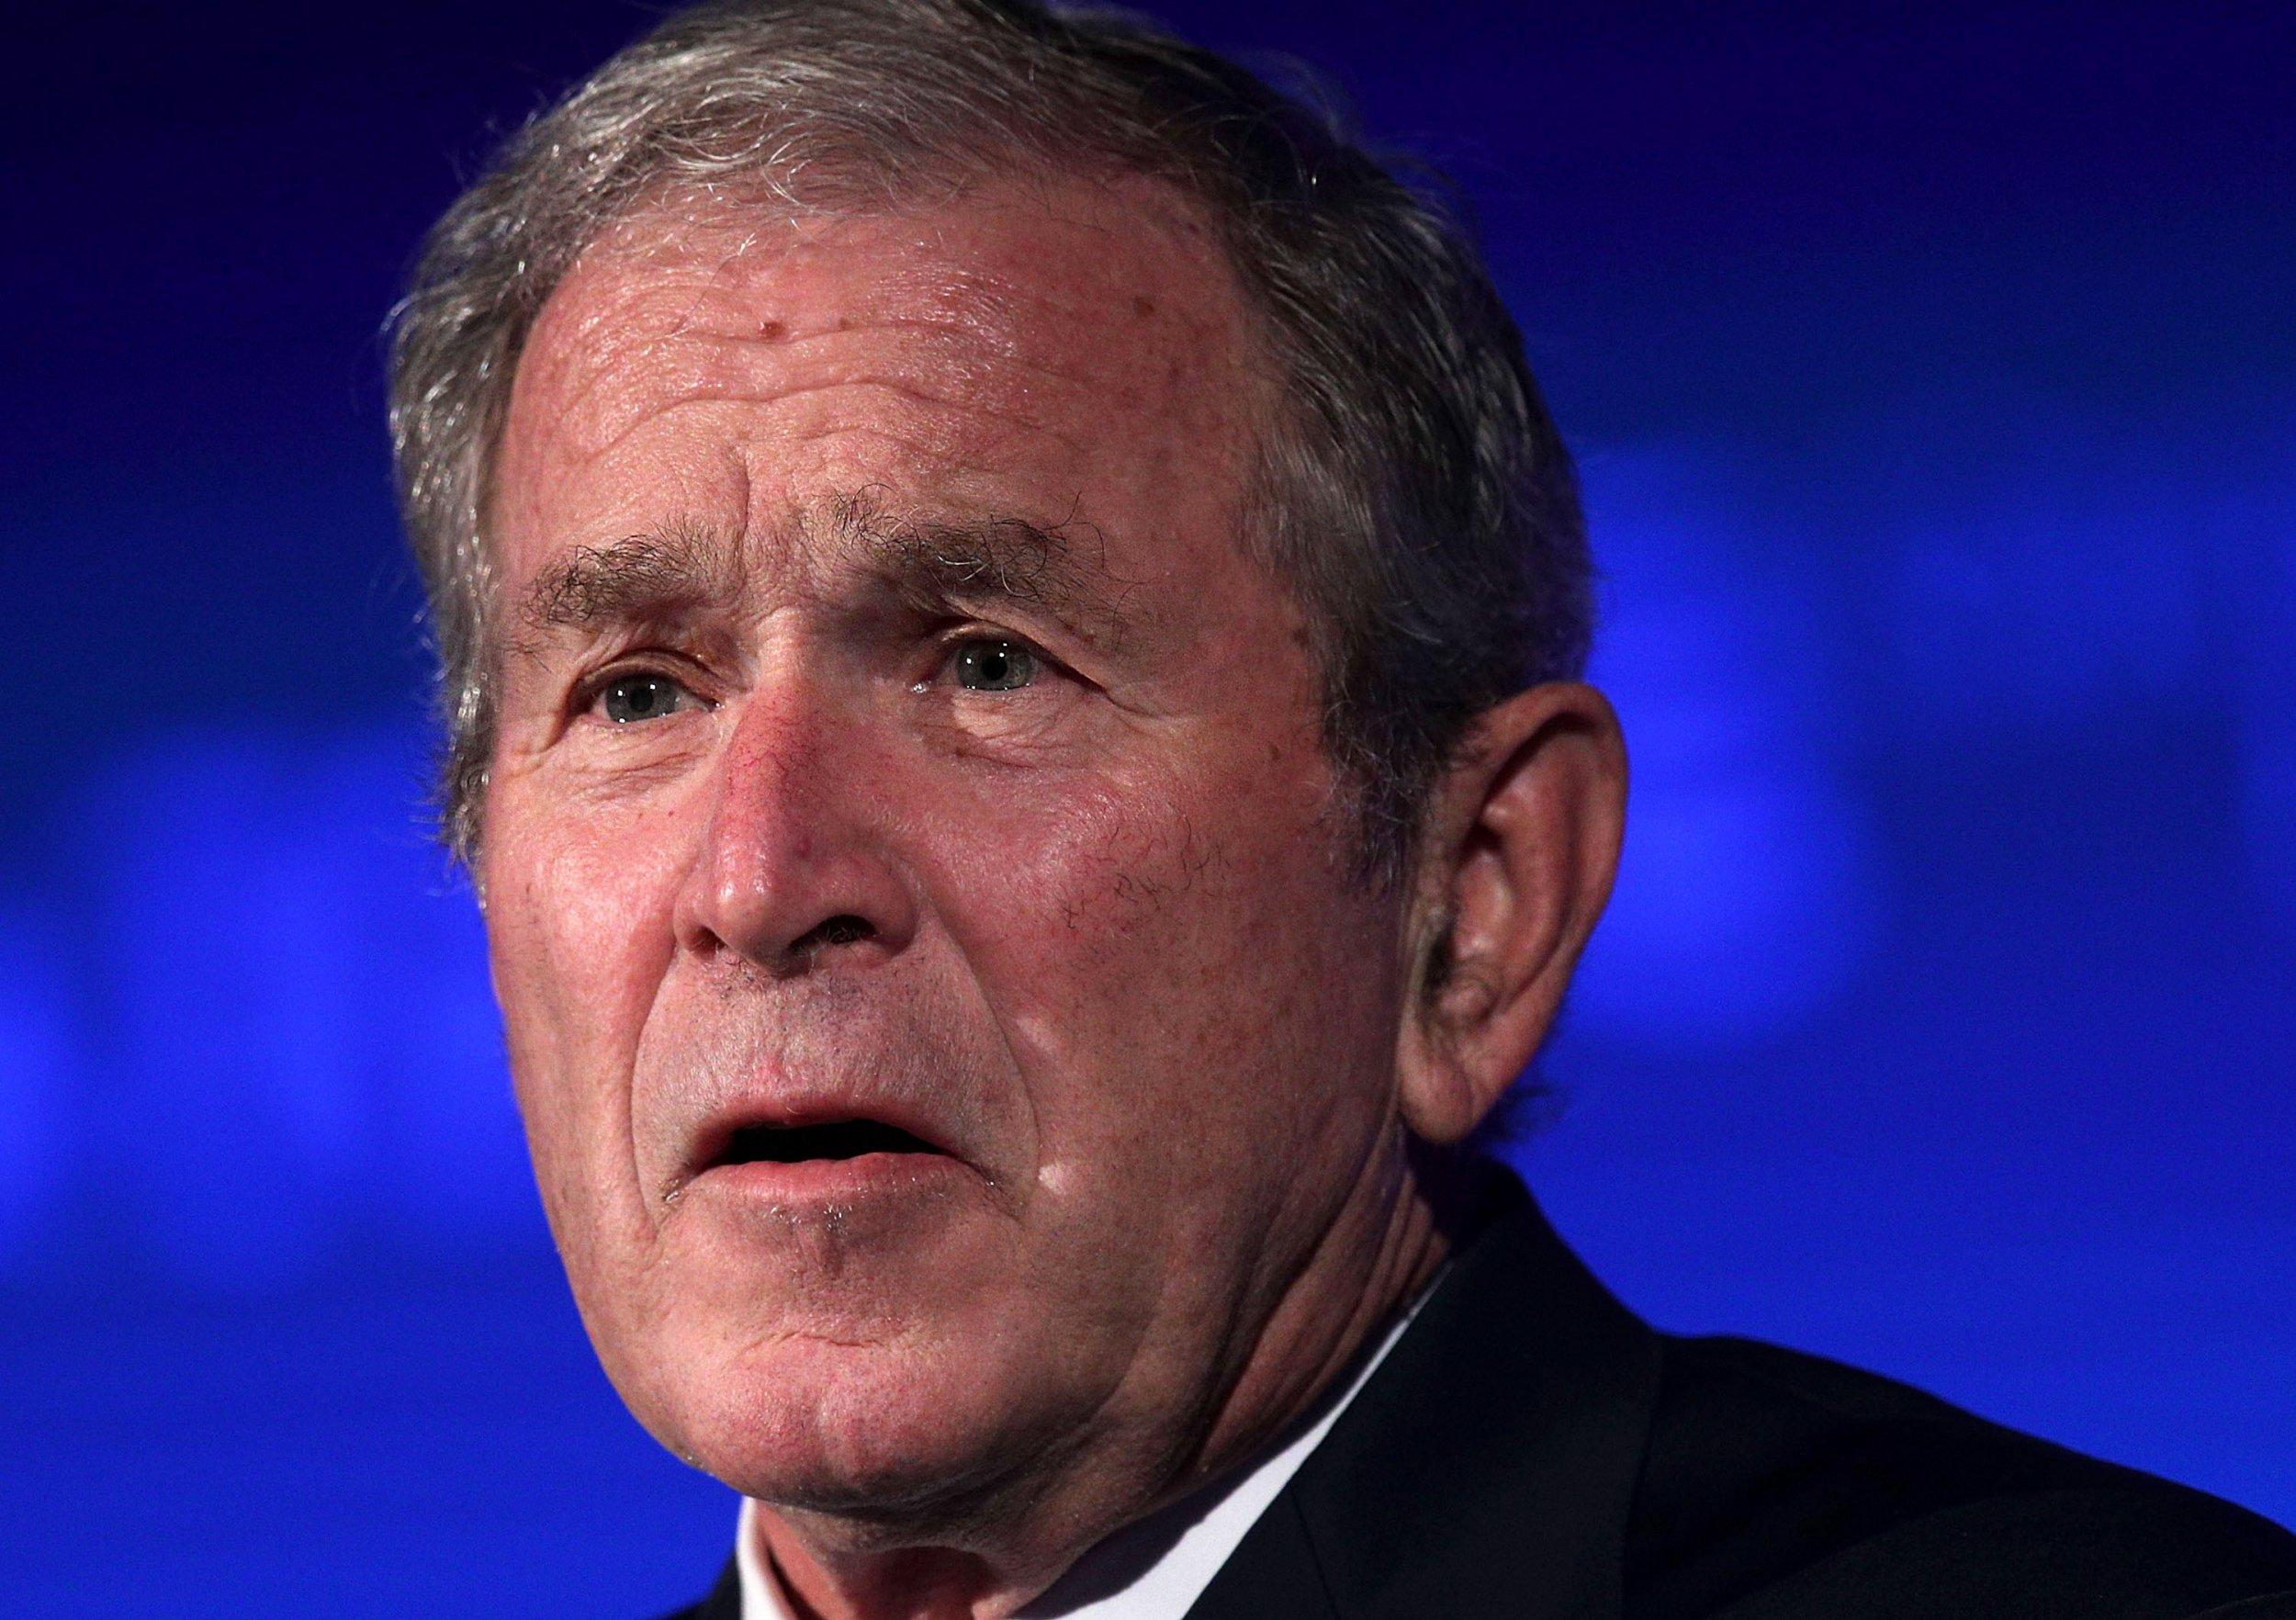 10_18_George_W_Bush_Bigotry_Trump